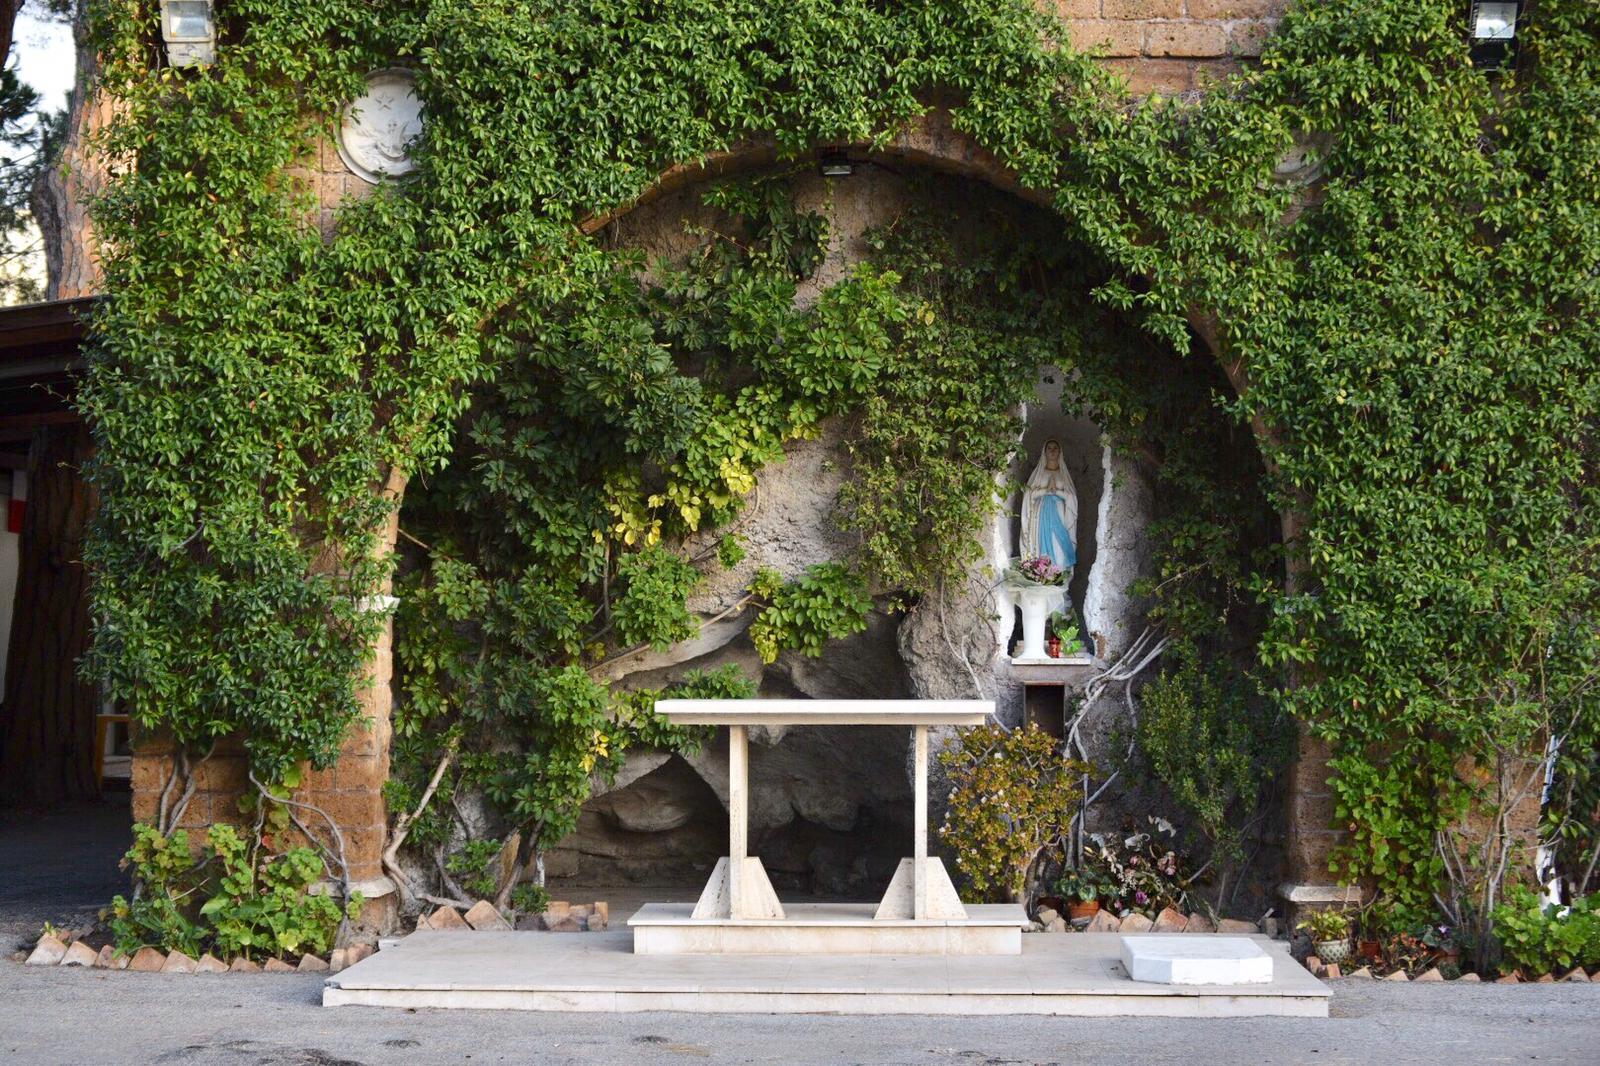 Arriva a Ostia la Madonna pellegrina di Lourdes